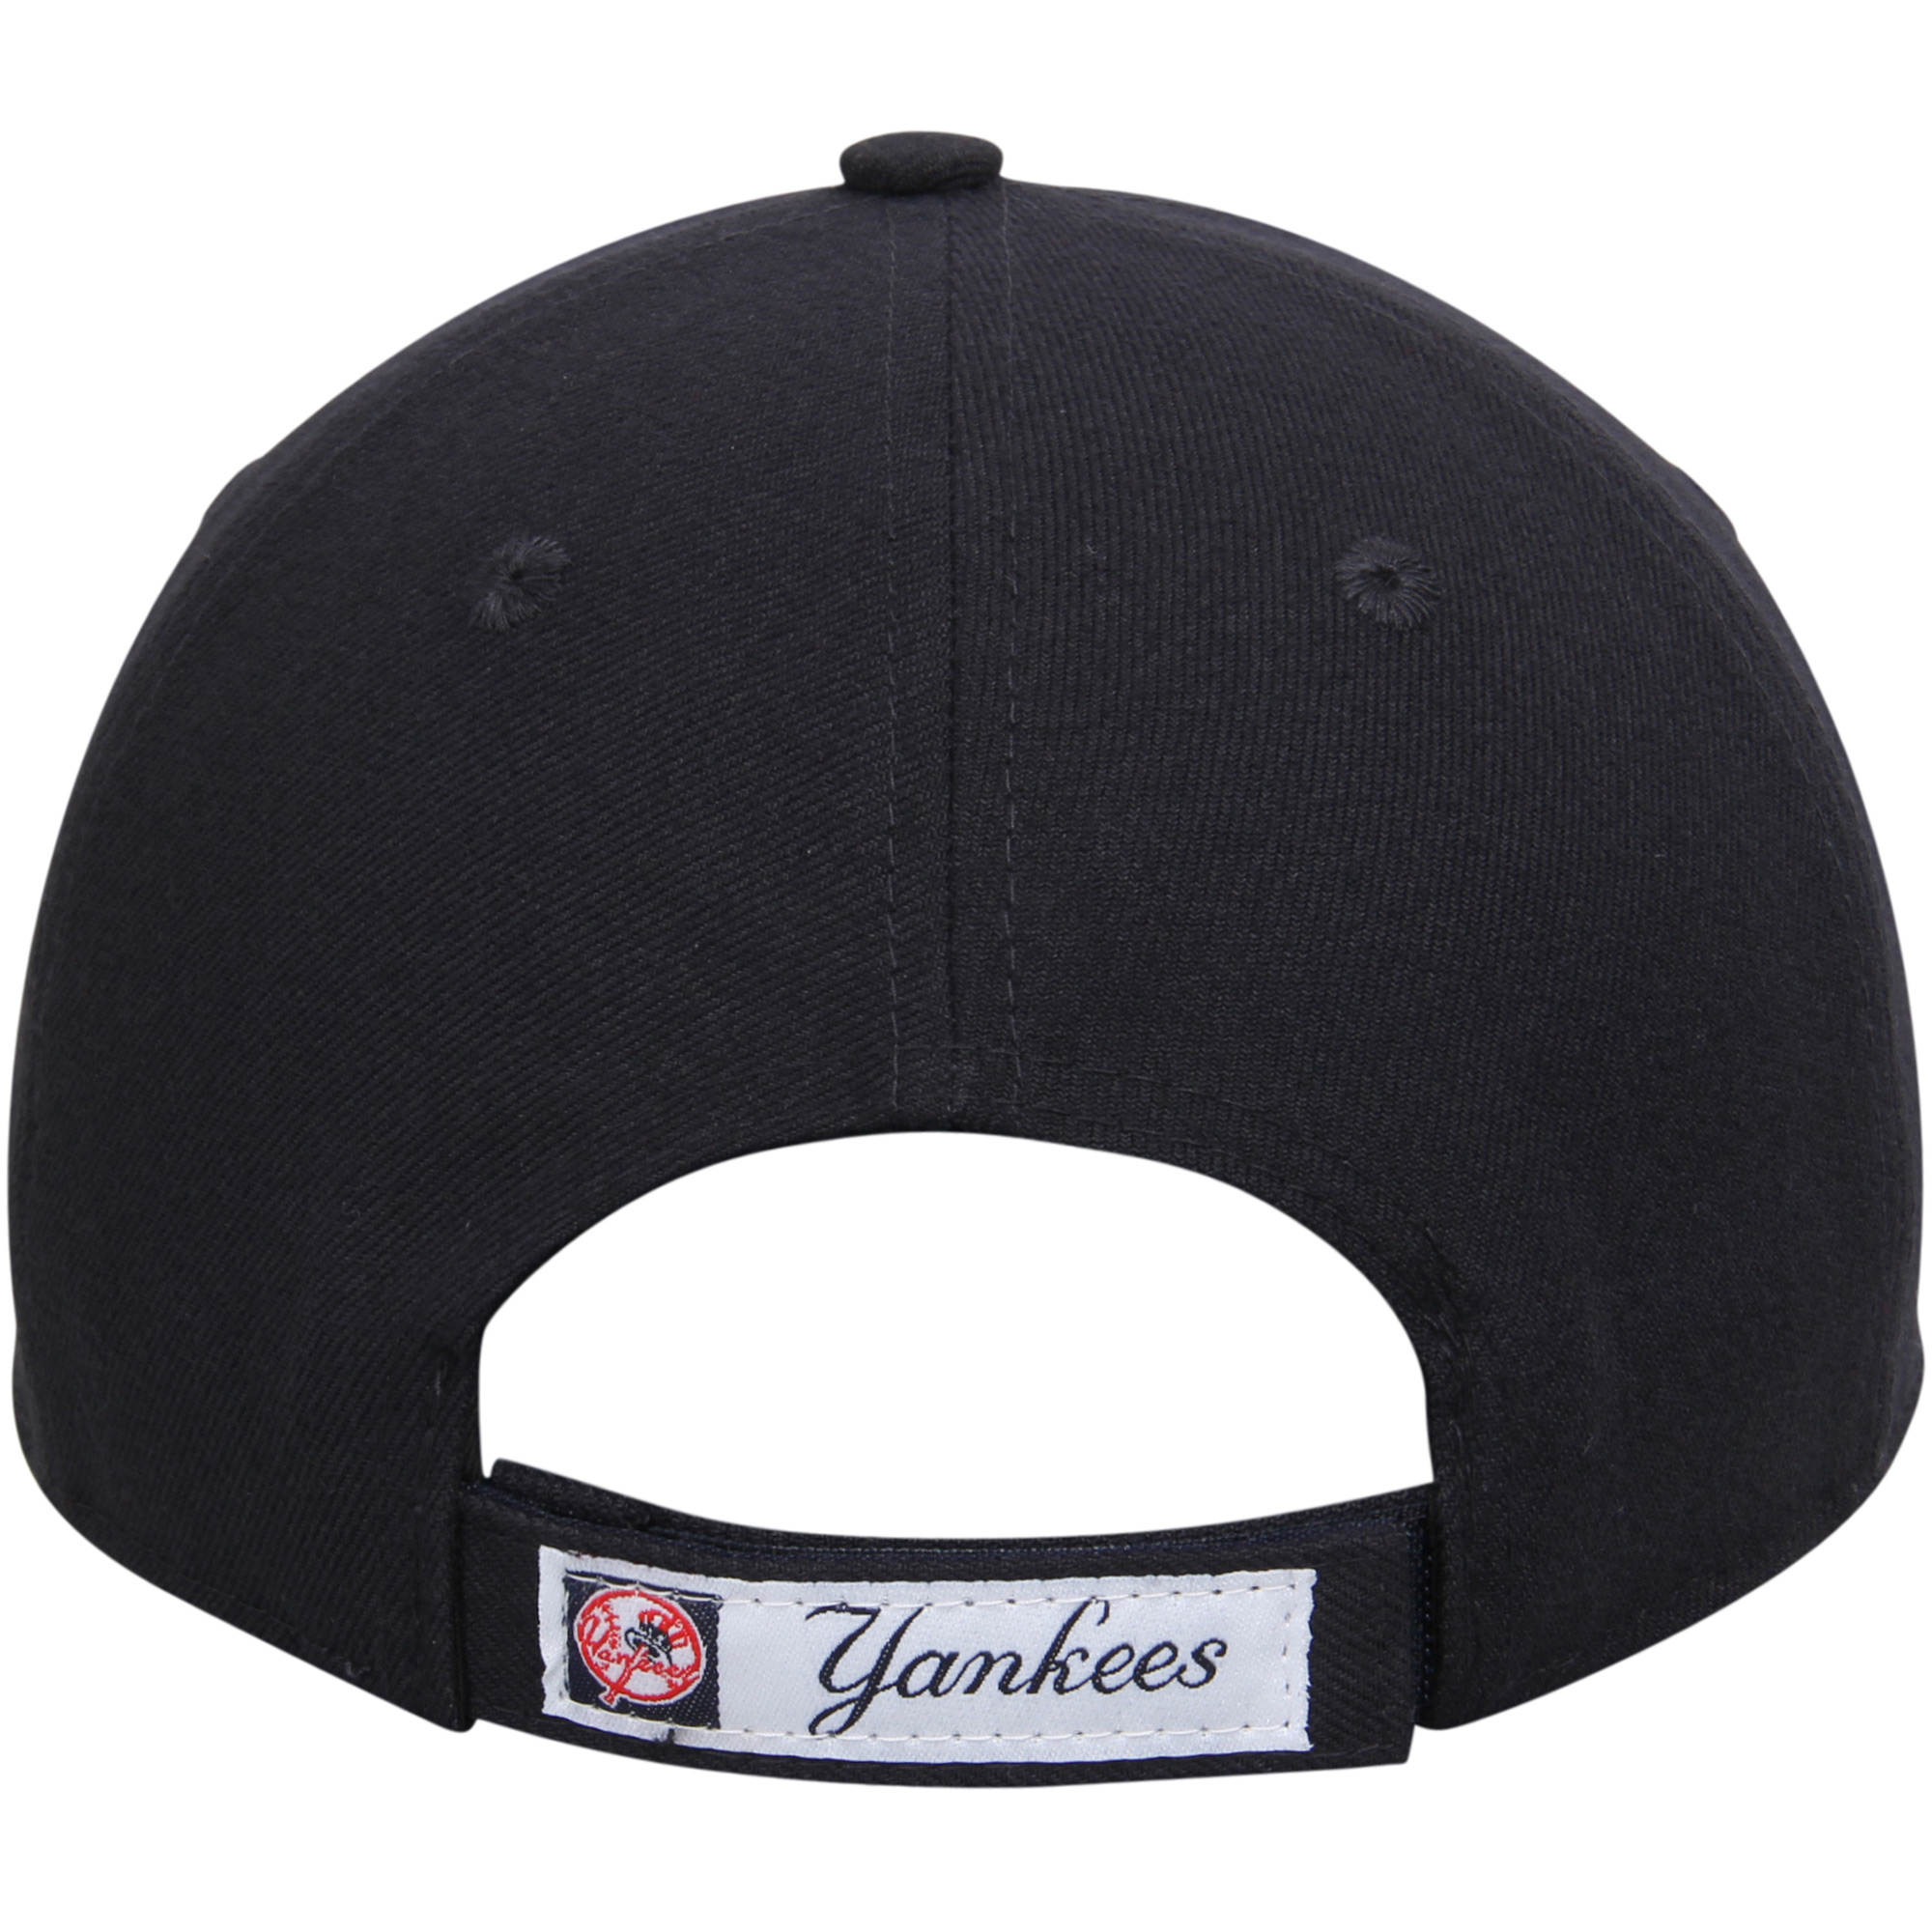 New York Yankees New Era Men s League 9Forty Adjustable Hat - Navy - OSFA -  Walmart.com 64011e4e3